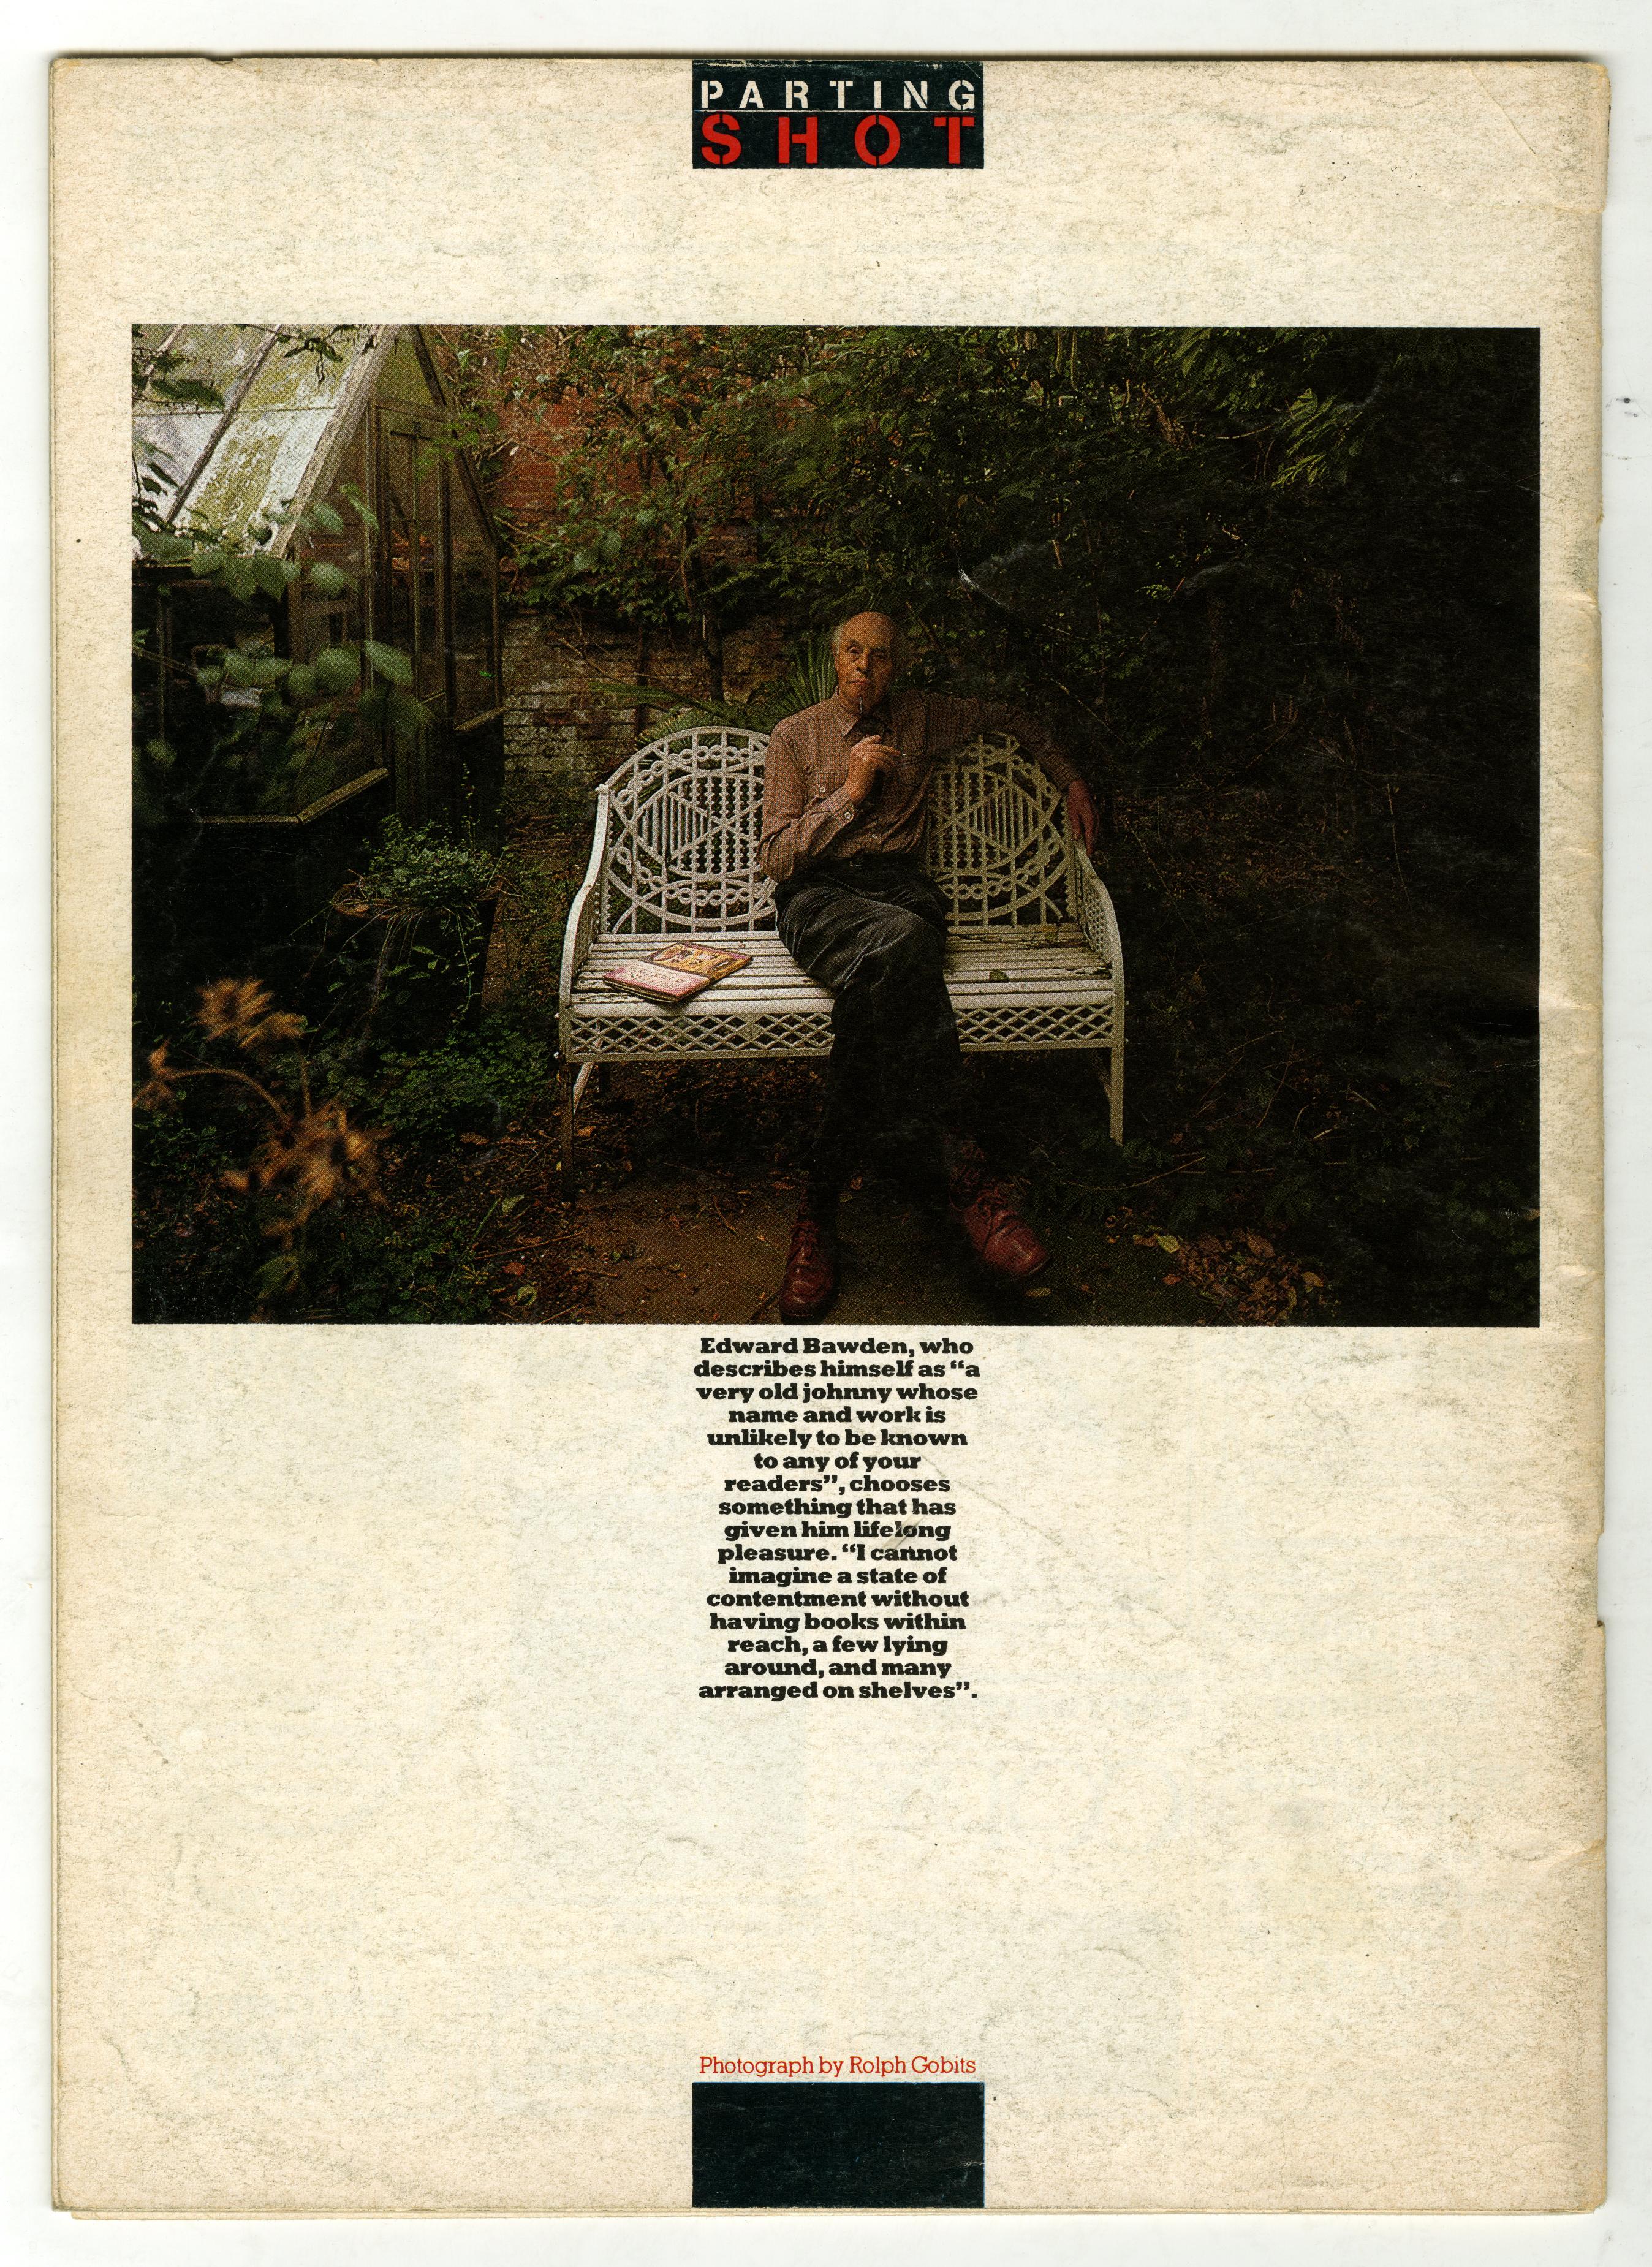 Rolph Gobits, Edward Bawden, Direction magazine-01